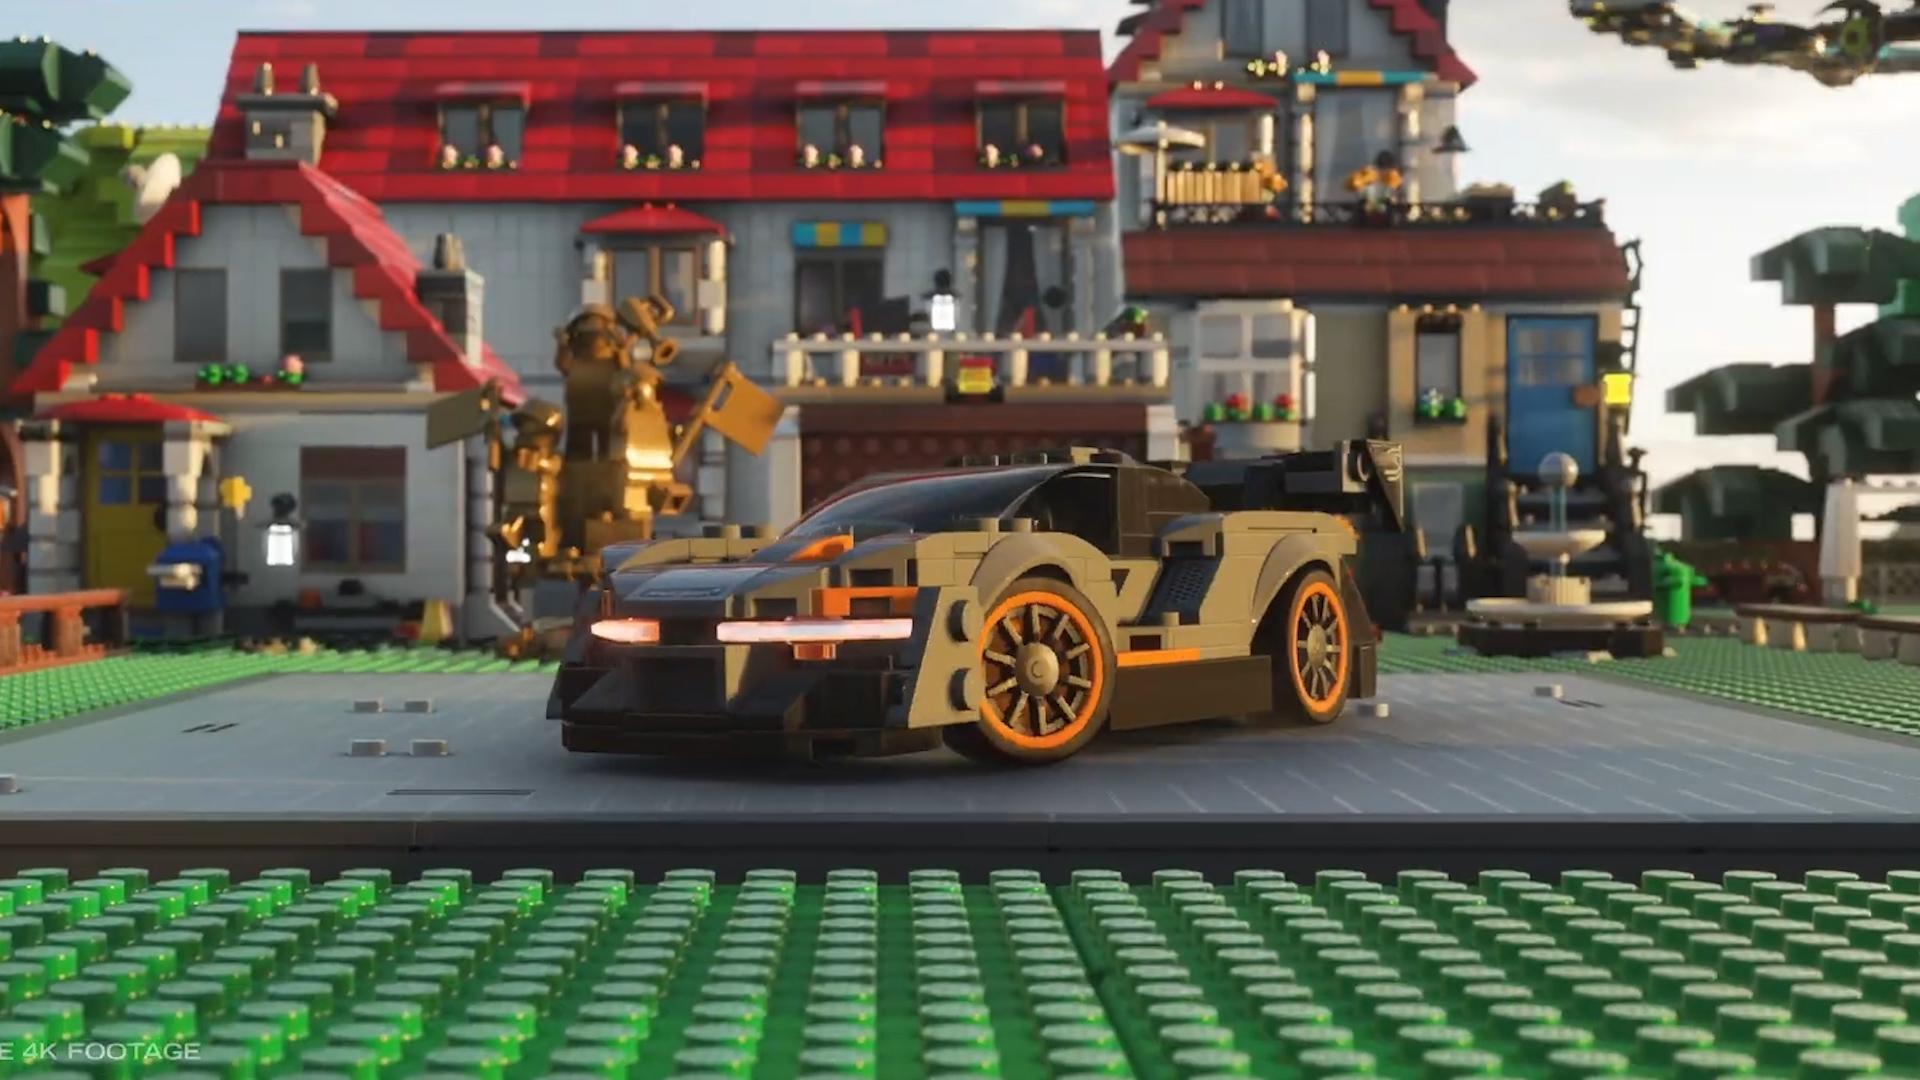 Forza Horizon 4 gets LEGO expansion